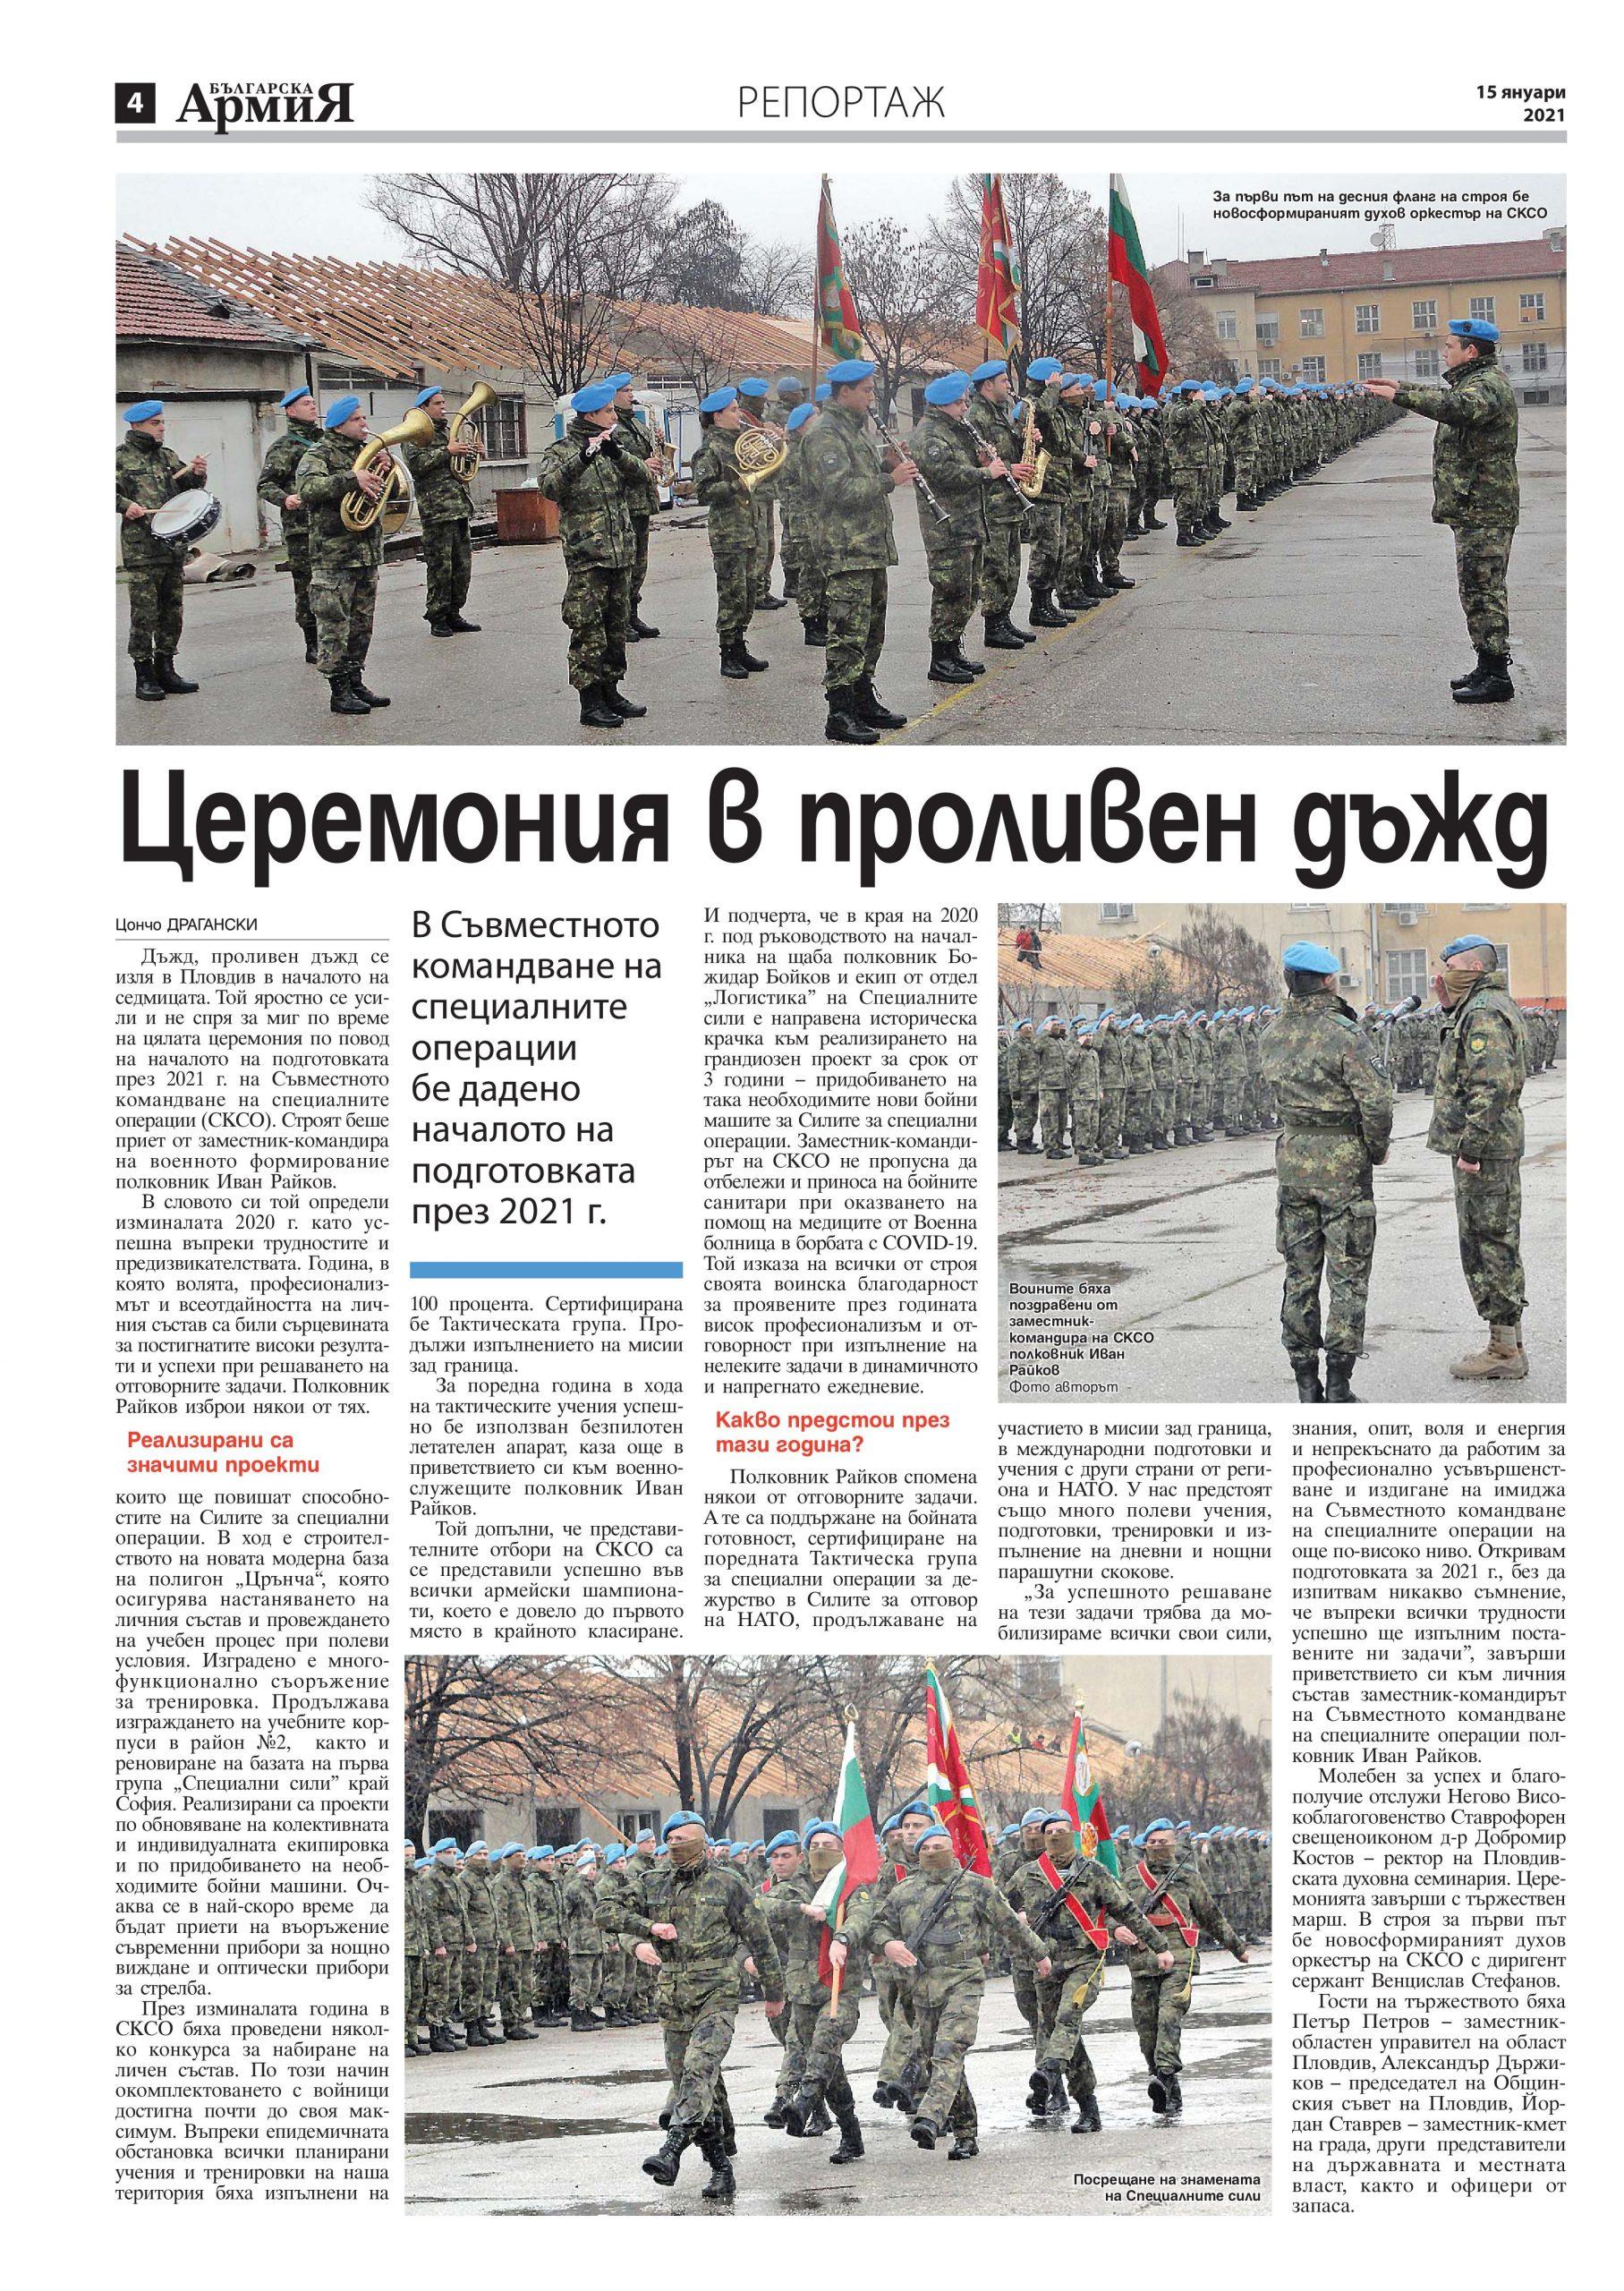 https://armymedia.bg/wp-content/uploads/2015/06/04-55-scaled.jpg